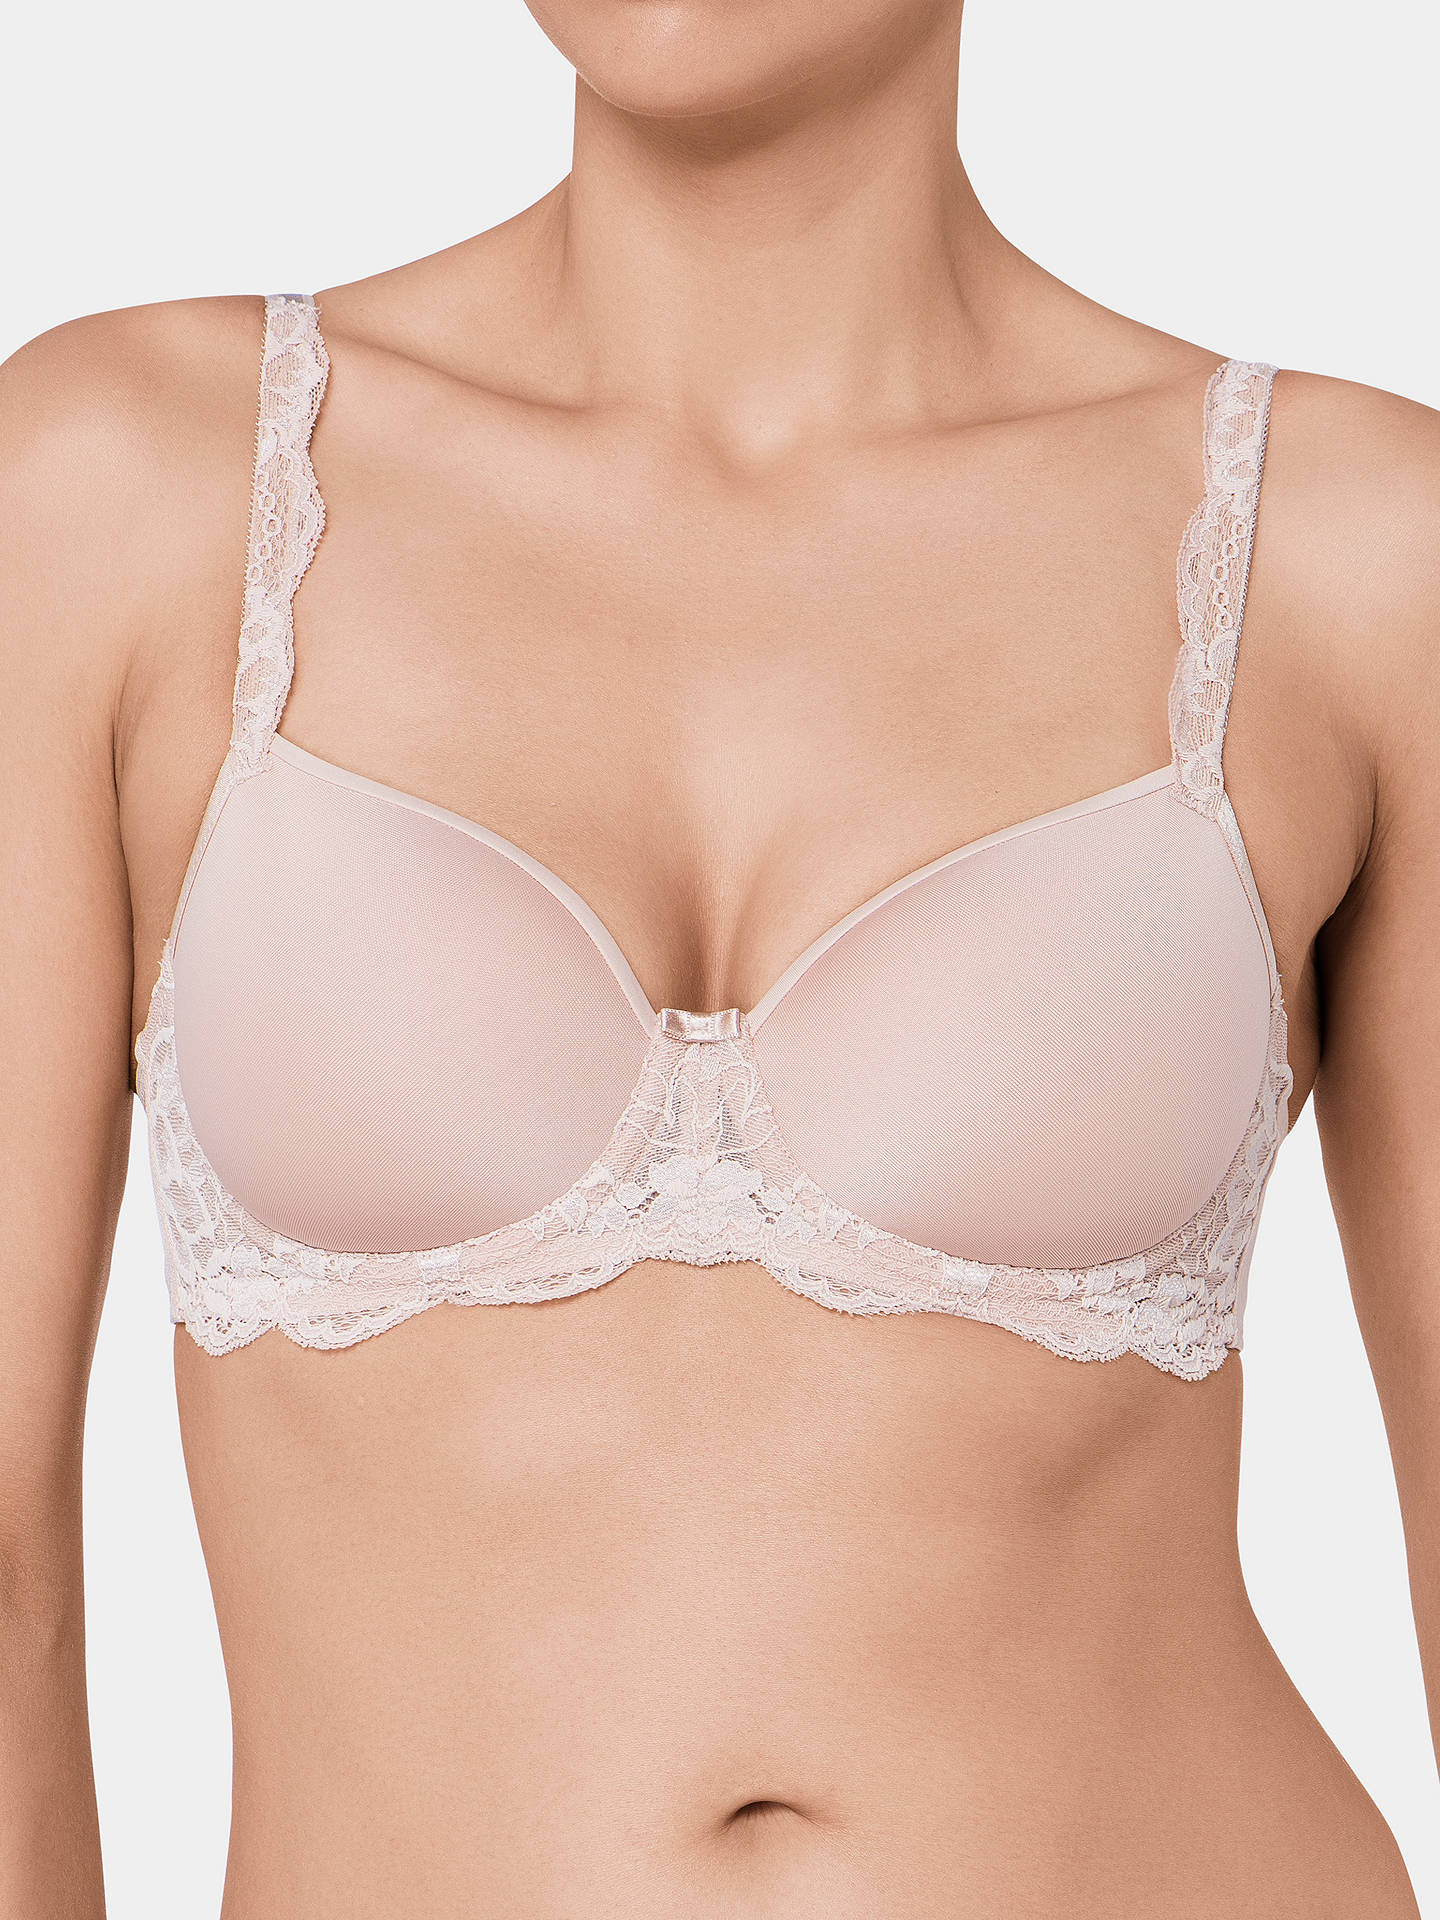 Internal vaginal creampies